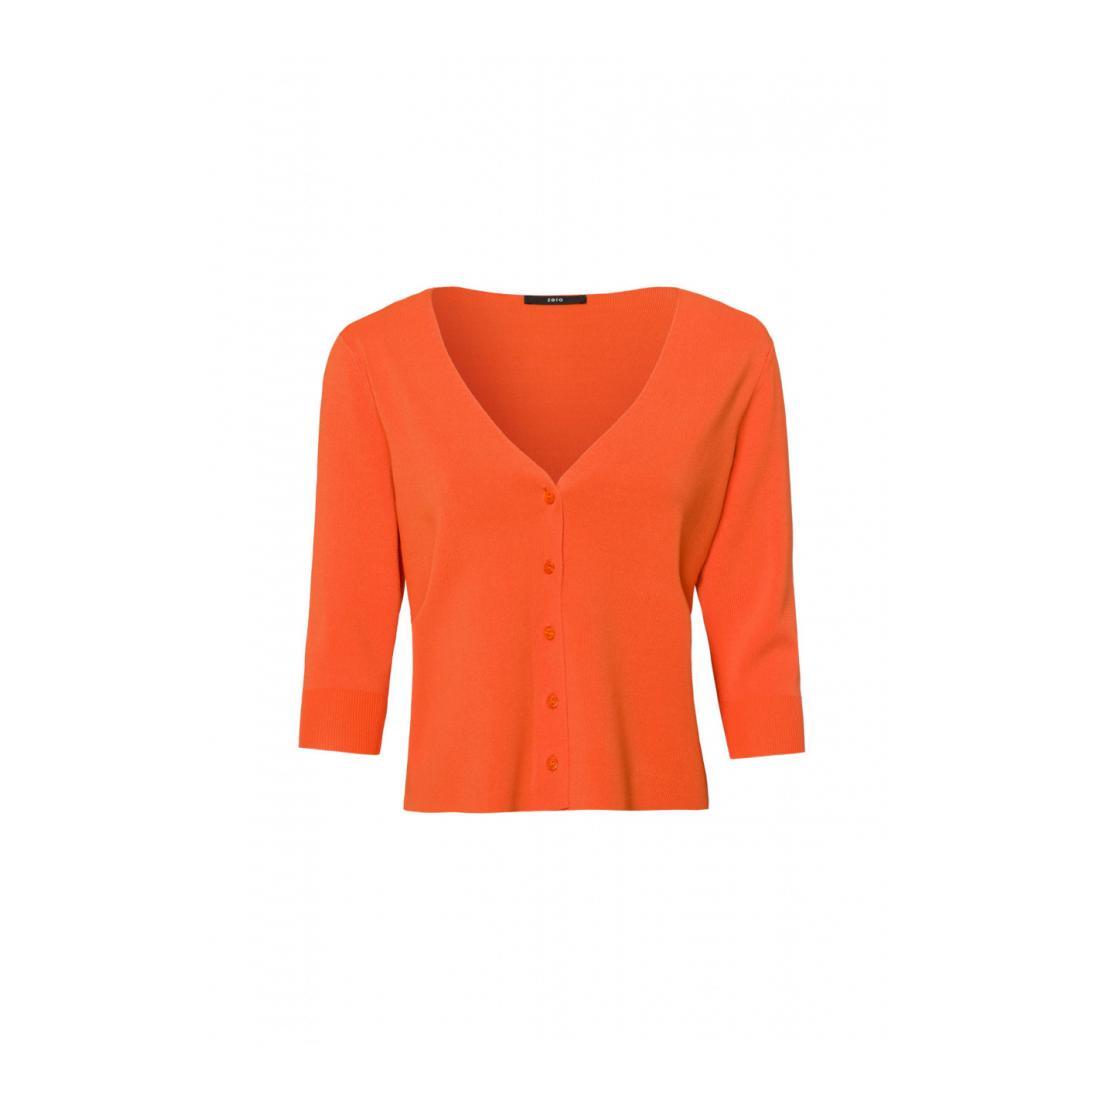 Zero Pullover Damen Cardigan short boxy style